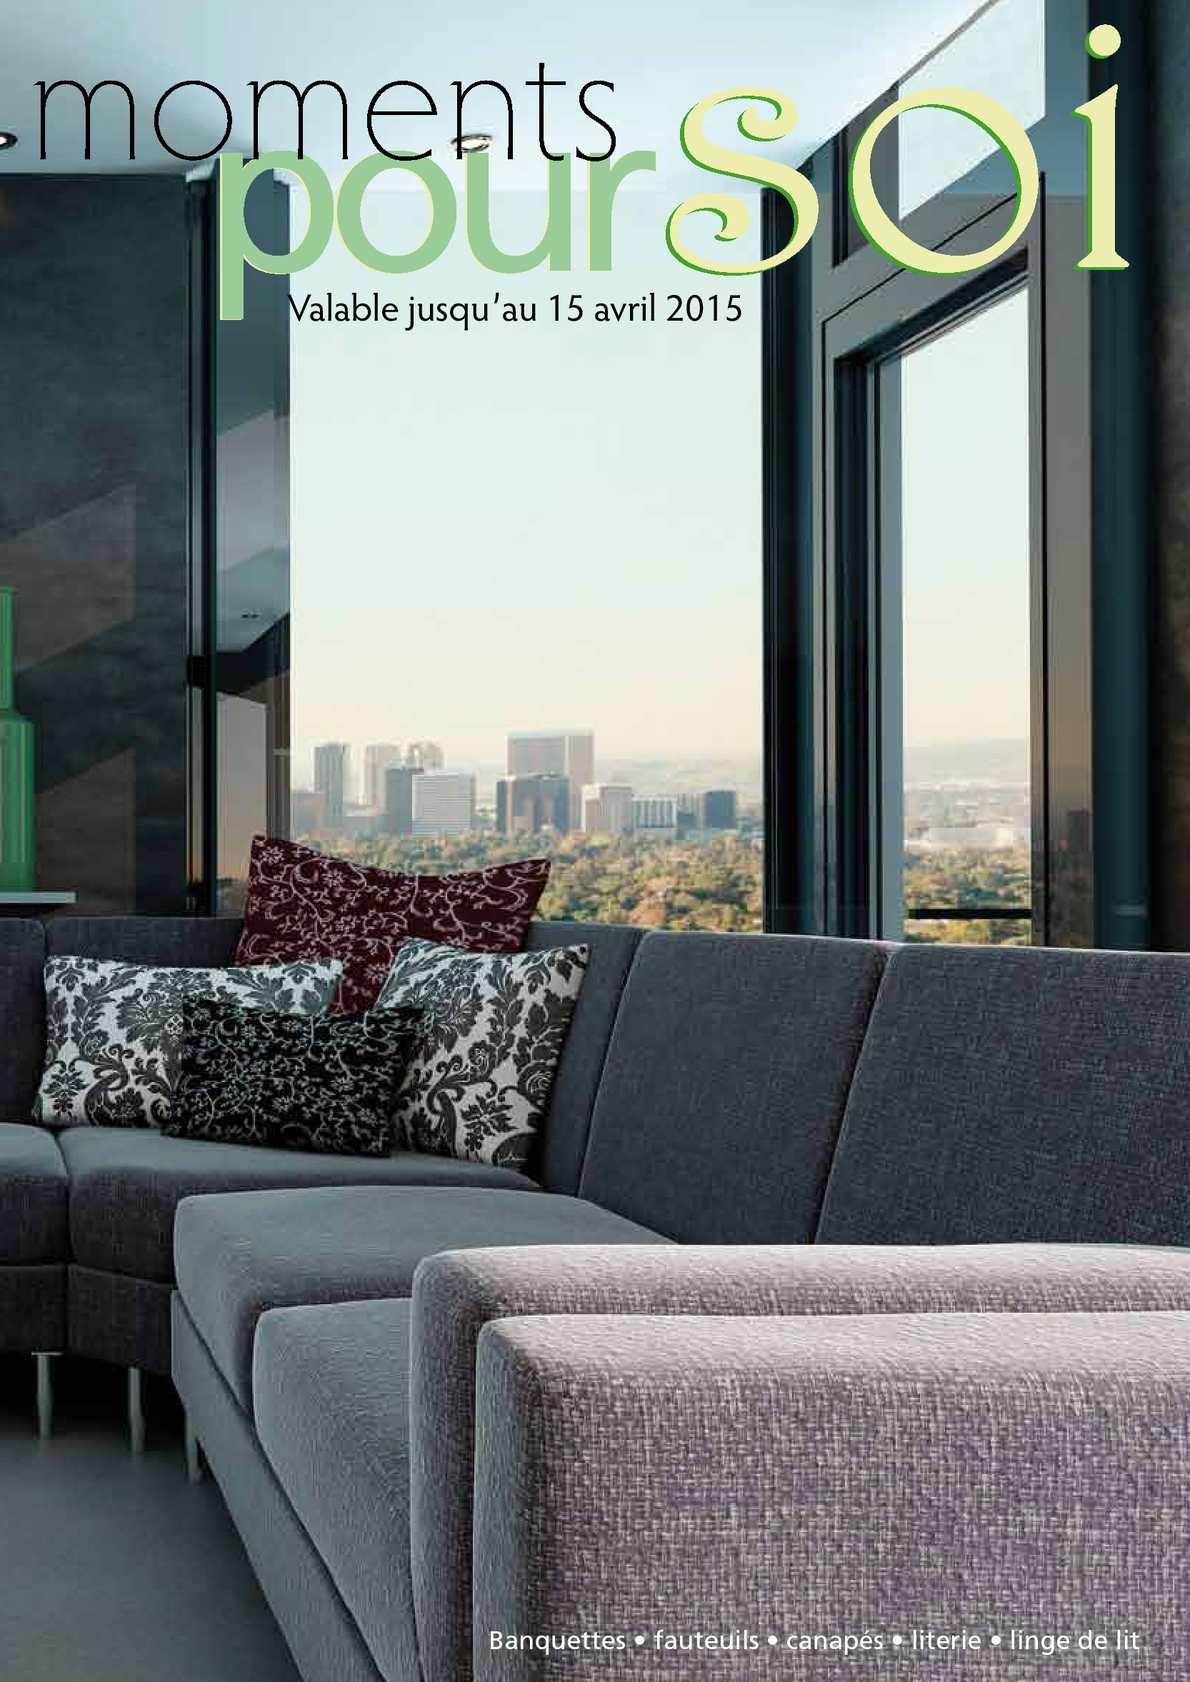 calam o catalogue moments pour soi 2014 2015. Black Bedroom Furniture Sets. Home Design Ideas